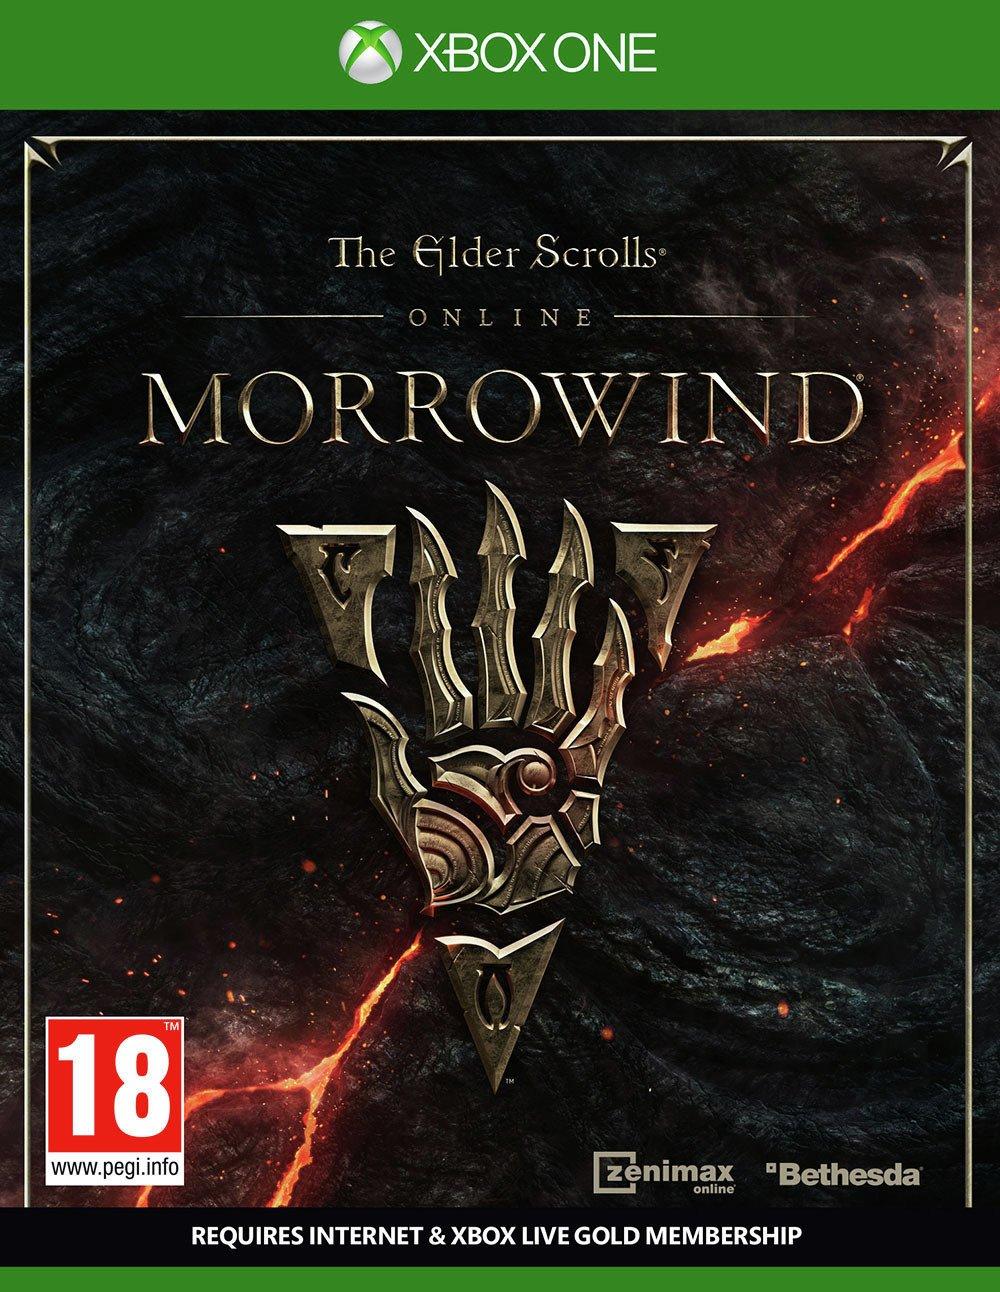 The Elder Scrolls Online: Morrowind Xbox One Game